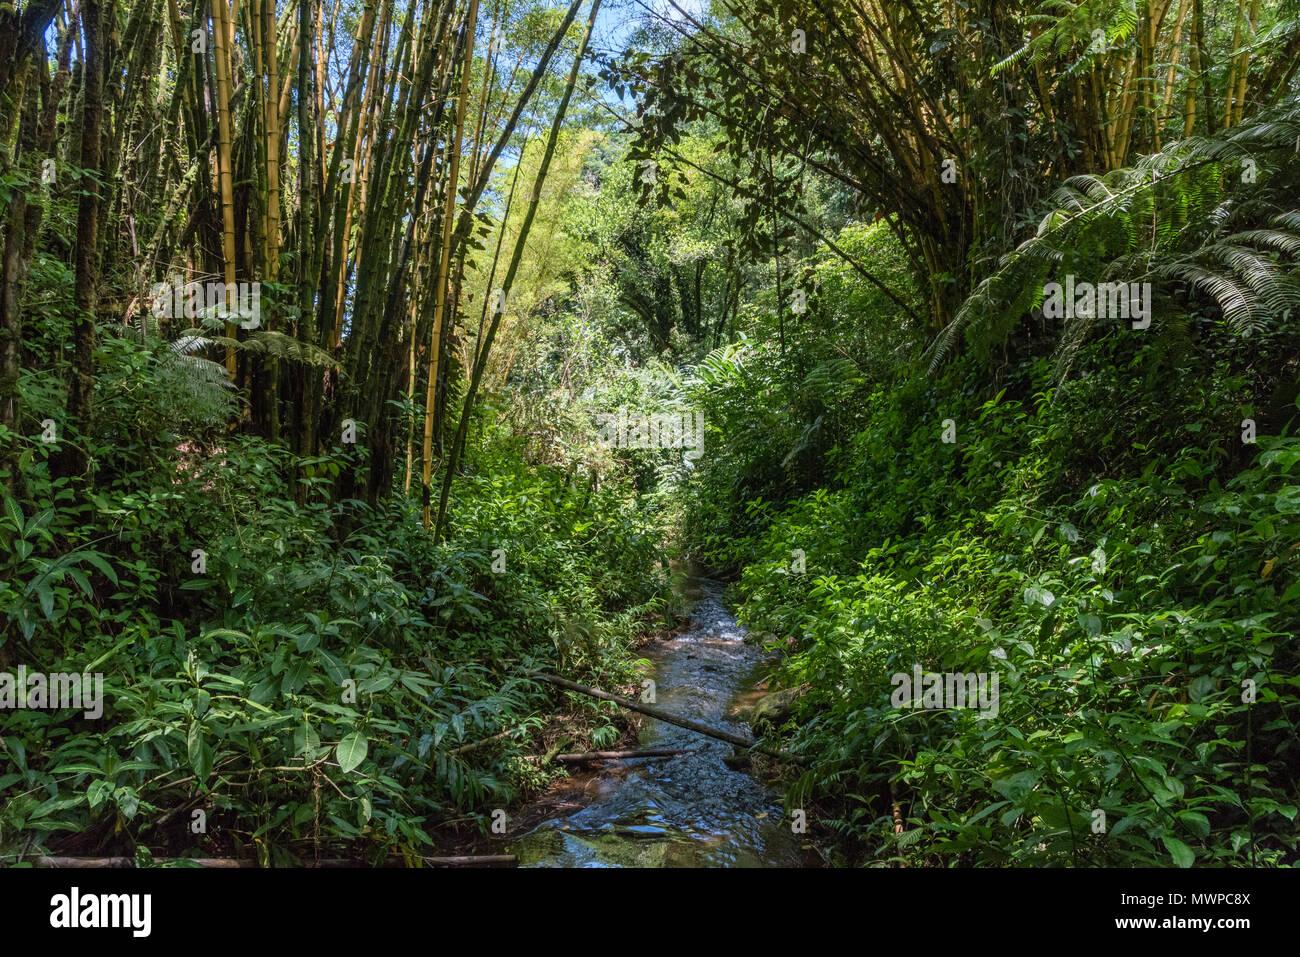 Rainforest On The Big Island: Tree Shade Rainforest Stock Photos & Tree Shade Rainforest